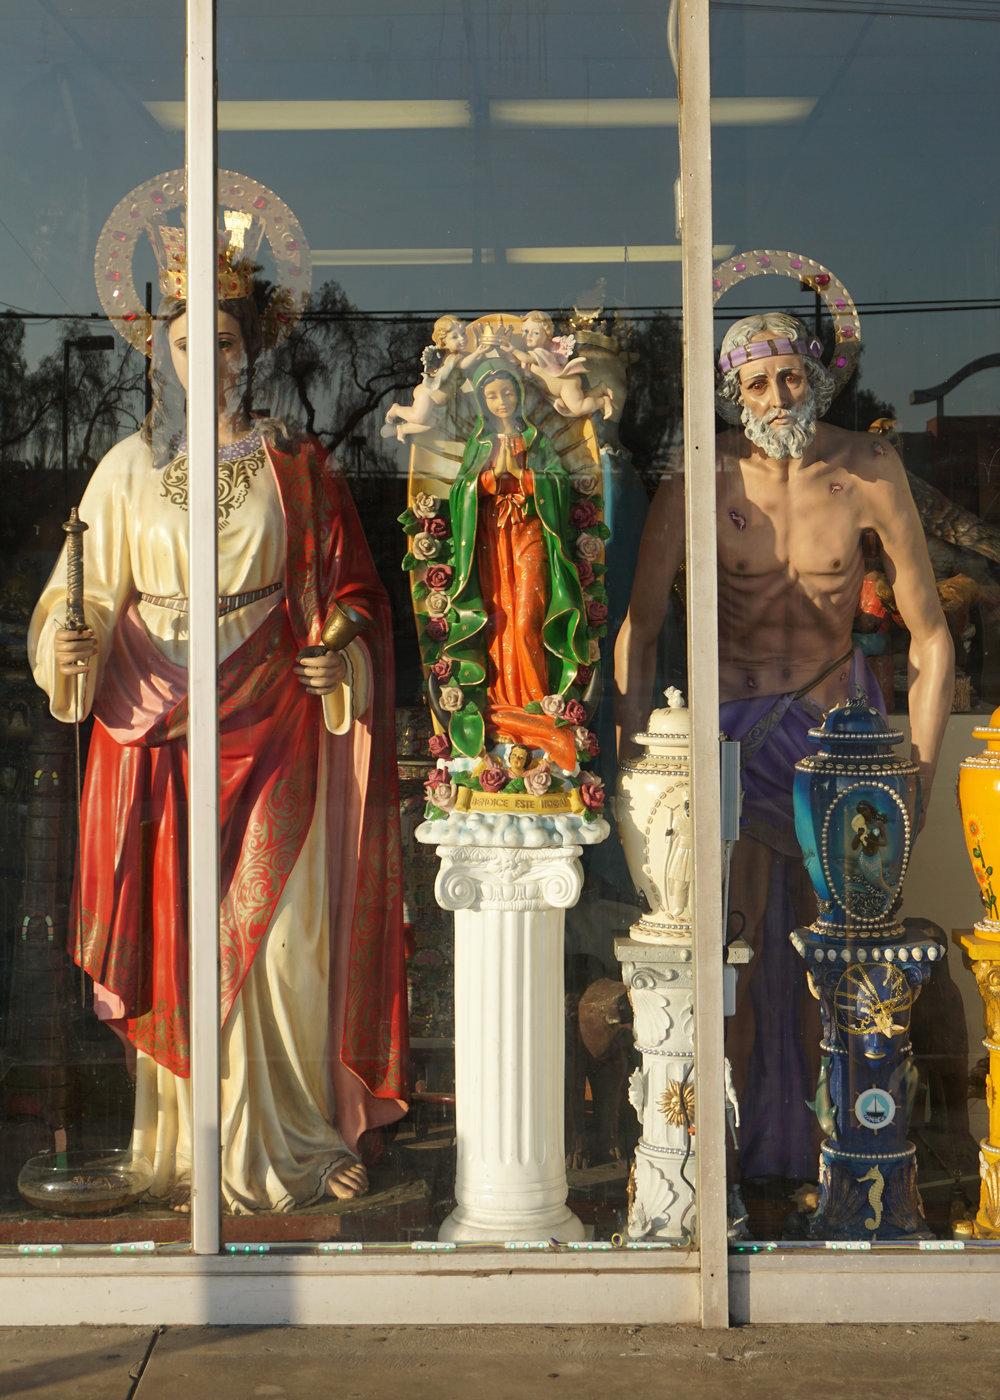 Guadalupe_Statues_SanFernandoRd.jpg